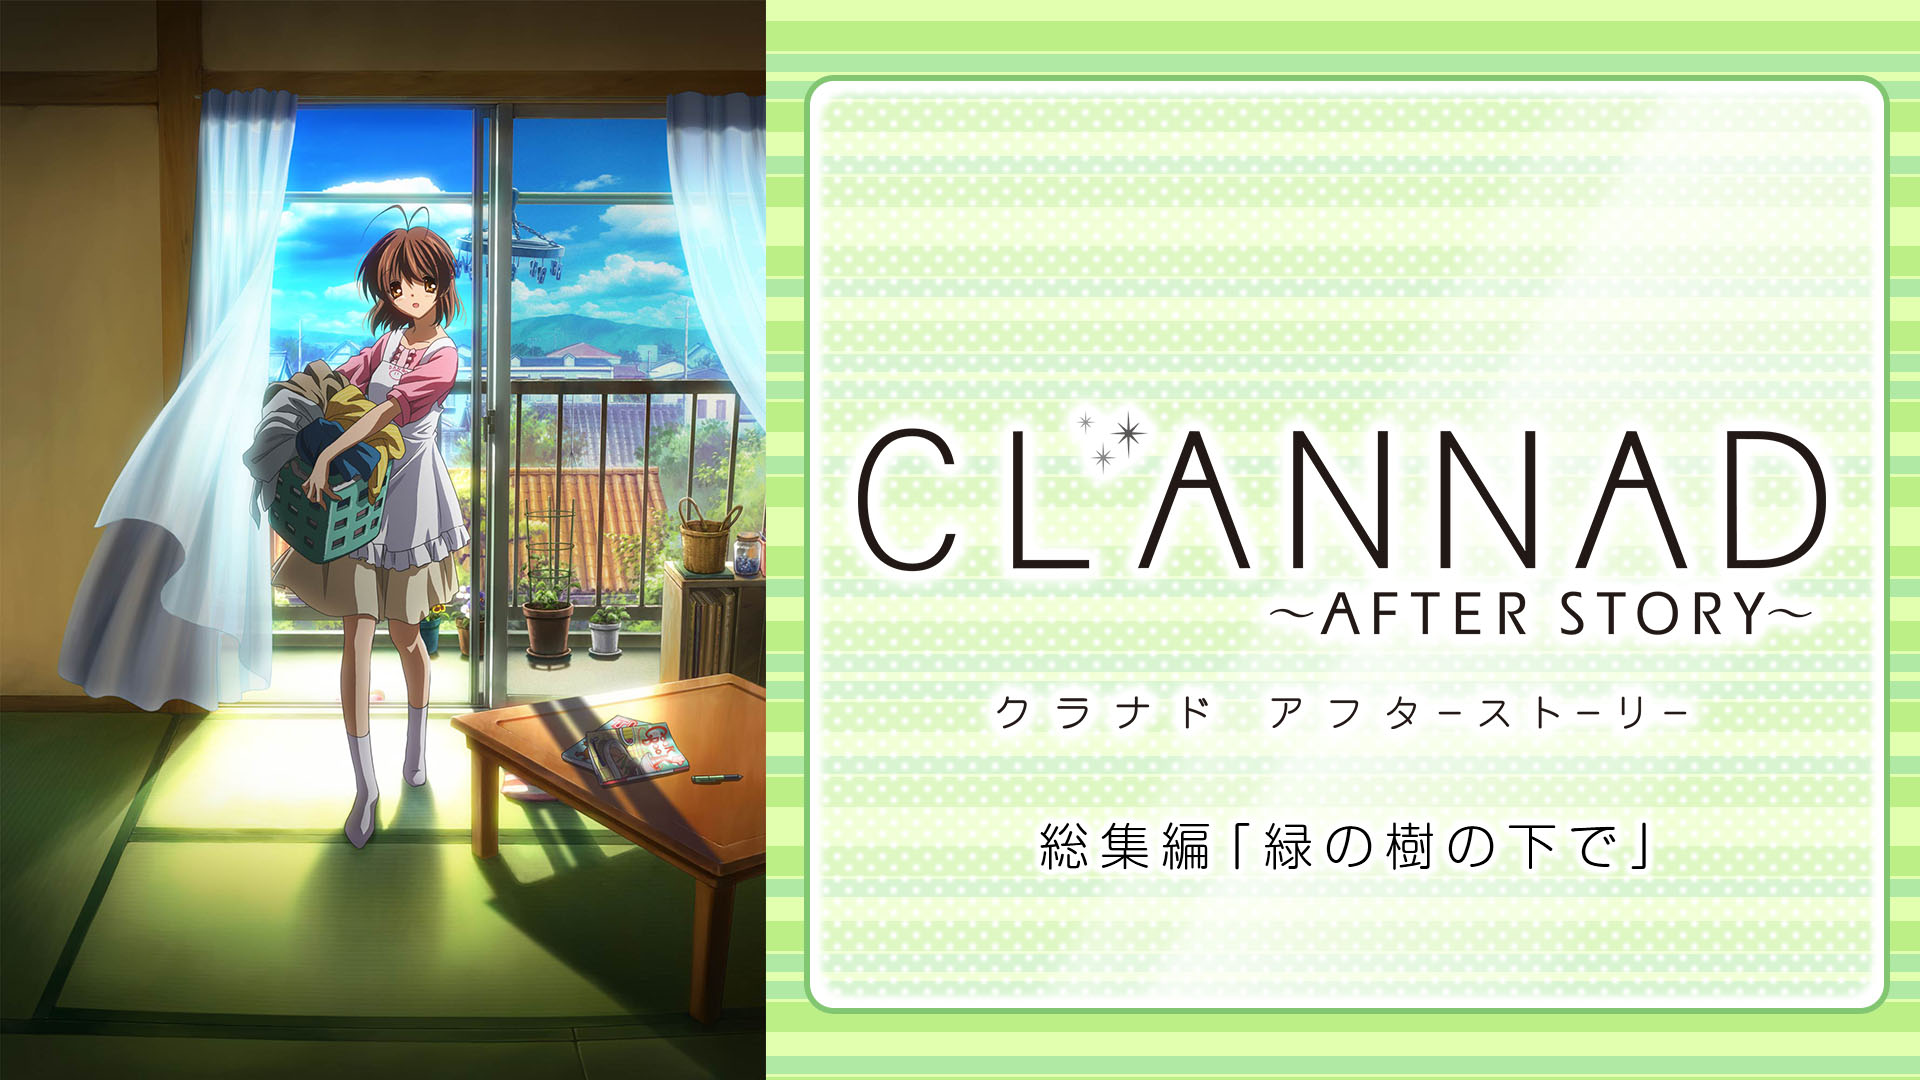 CLANNAD AFTER STORY 総集編 「緑の樹の下で」(dアニメストア)